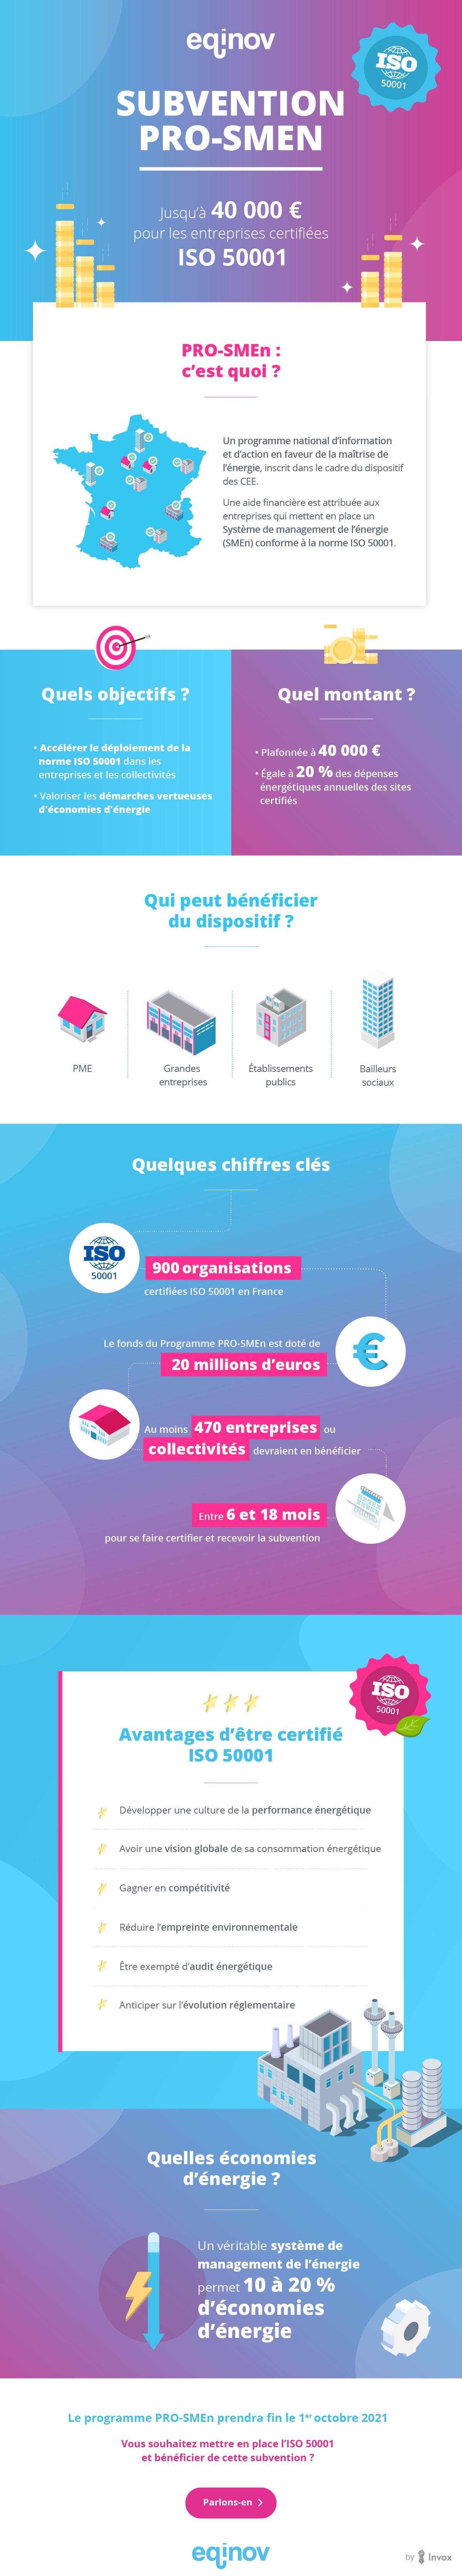 eqinov-infographie-Prime PRO-SMEn